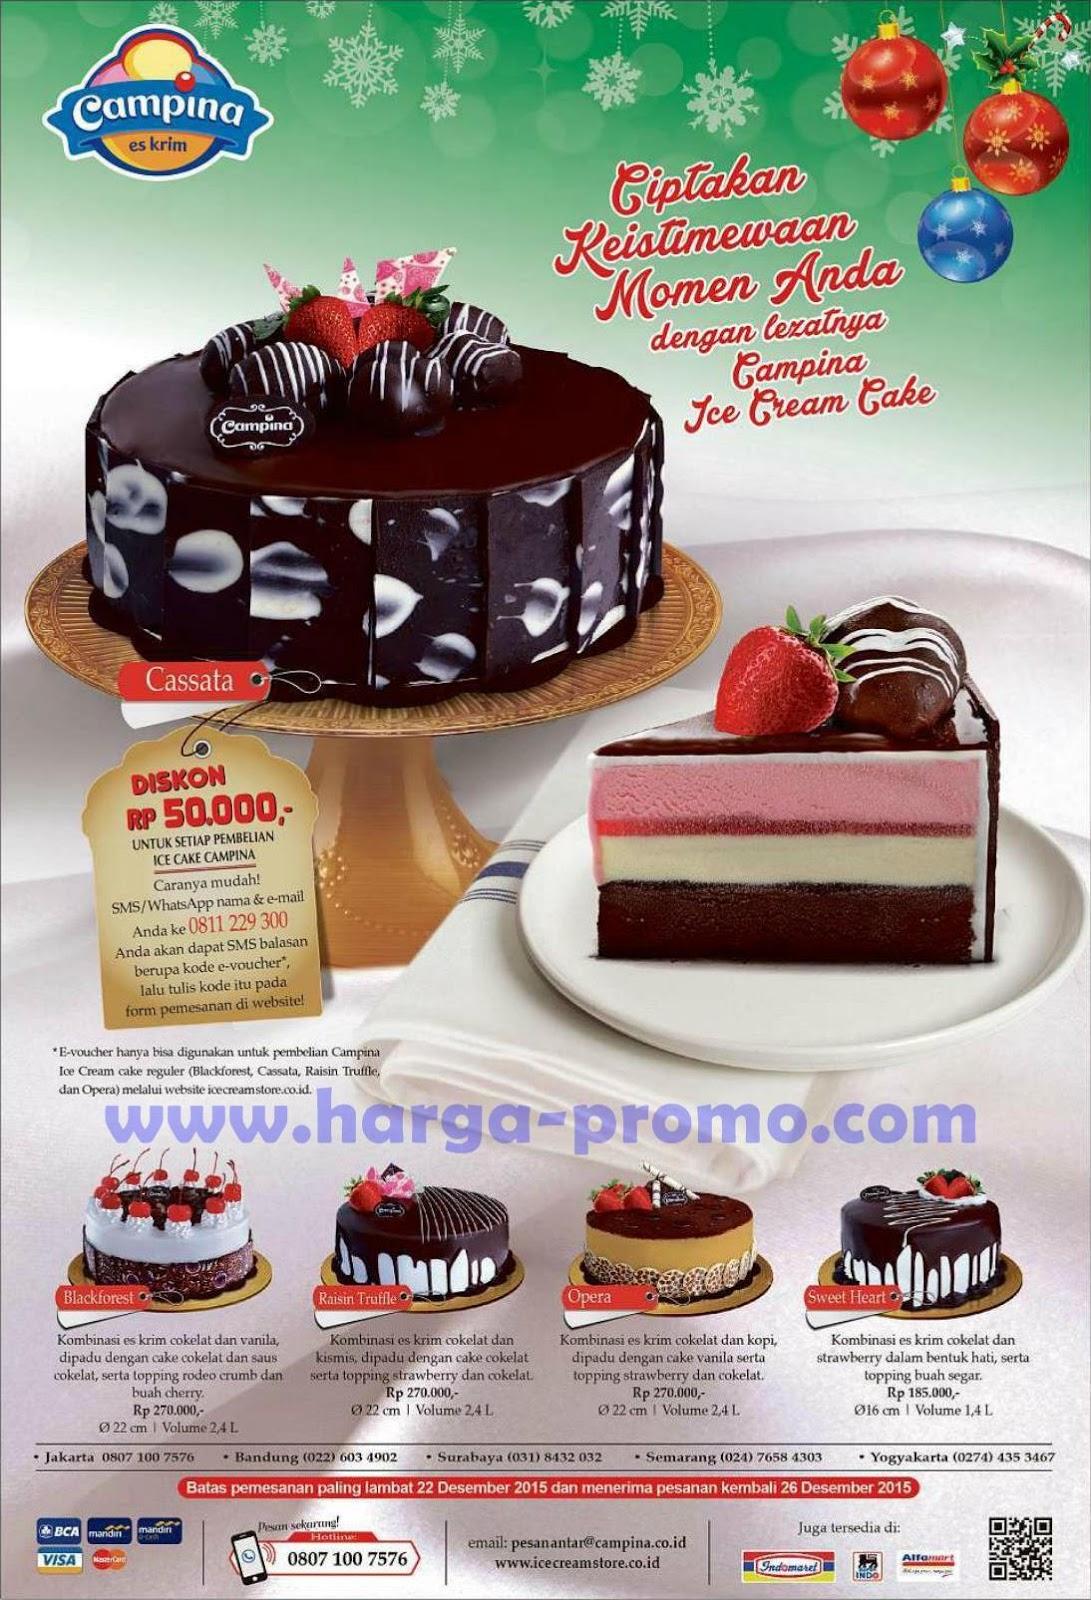 Best Ice Cream Cake Malaysia